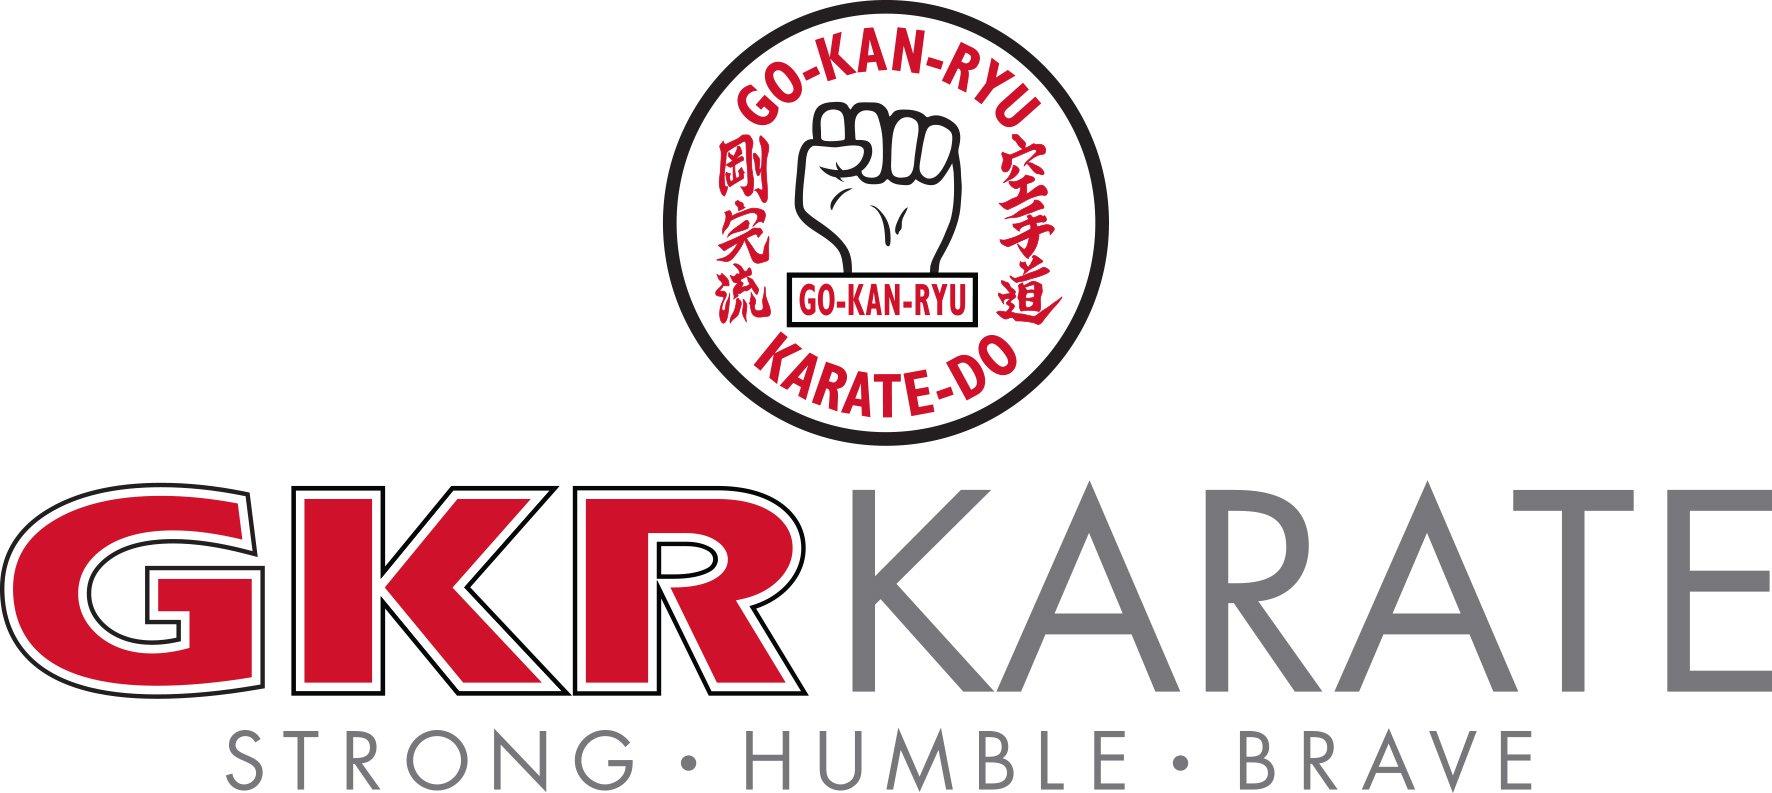 GKR Karate logo